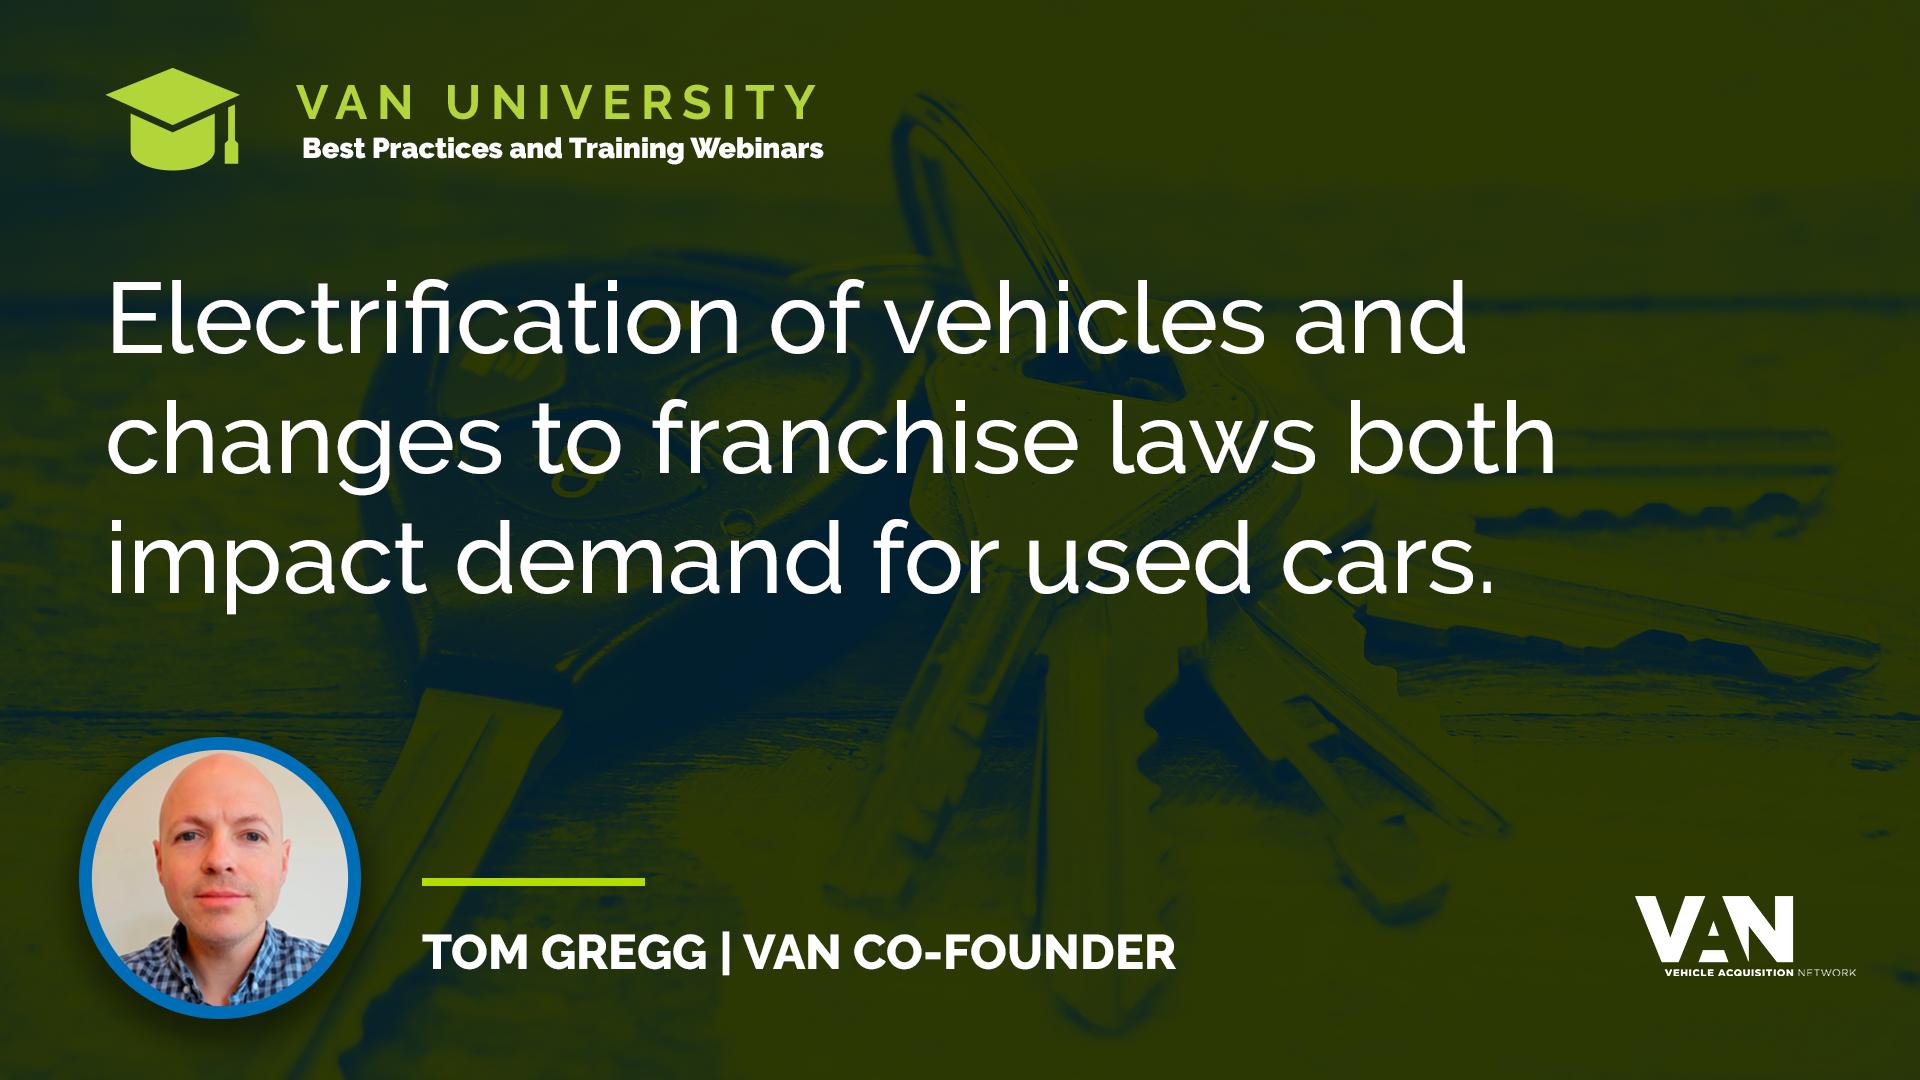 VAN Co-Founder Tom Gregg on demand for used cars